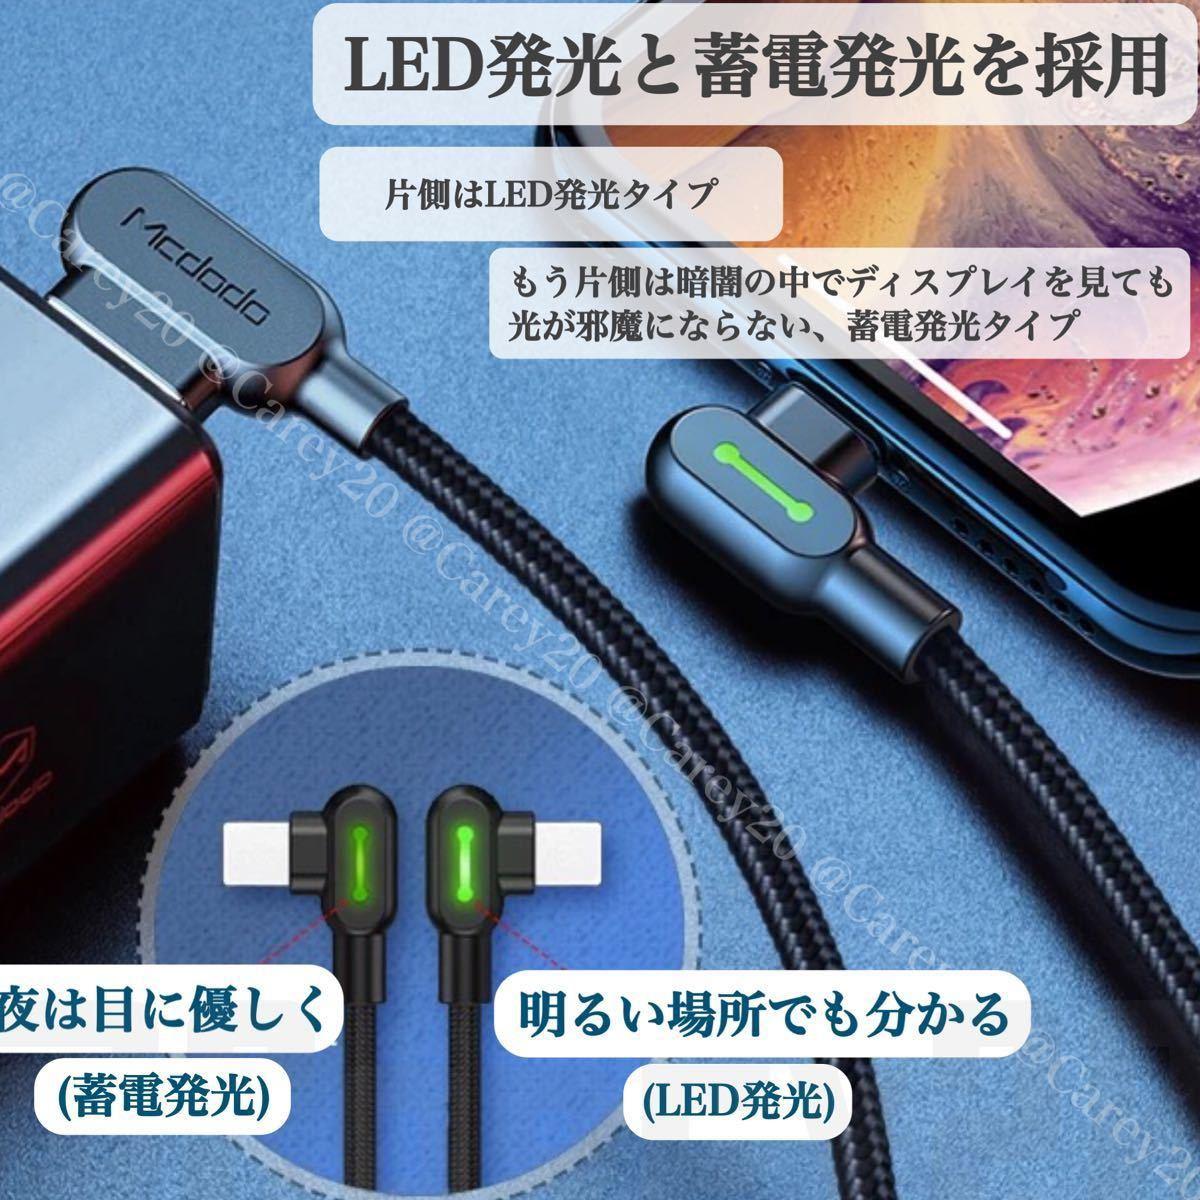 【L字型 3m】mcdodo社製 充電 ケーブル ライトニングケーブル iPhone急速充電 USB ケーブル データ転送 充電器